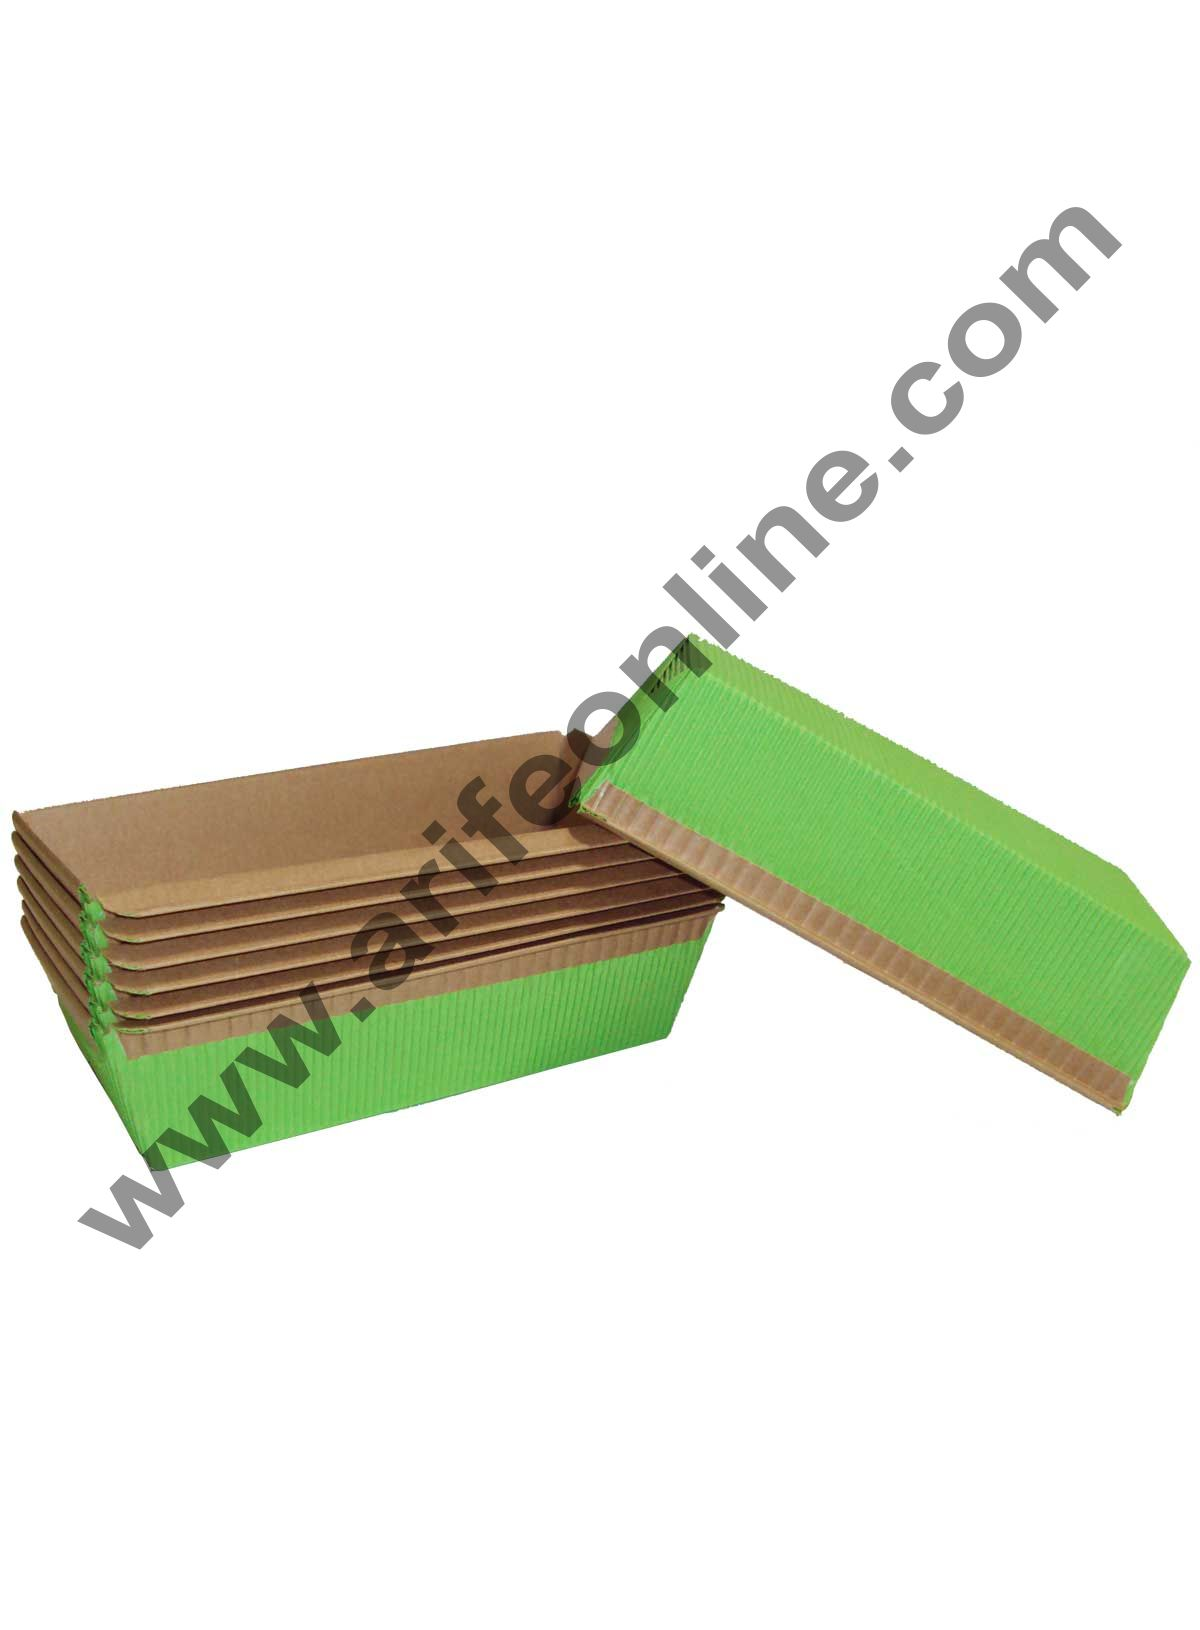 Novacart Bake & Serve Paper Baking Mould By Cake Decor - Plum Cake Mould Green 10 Pcs